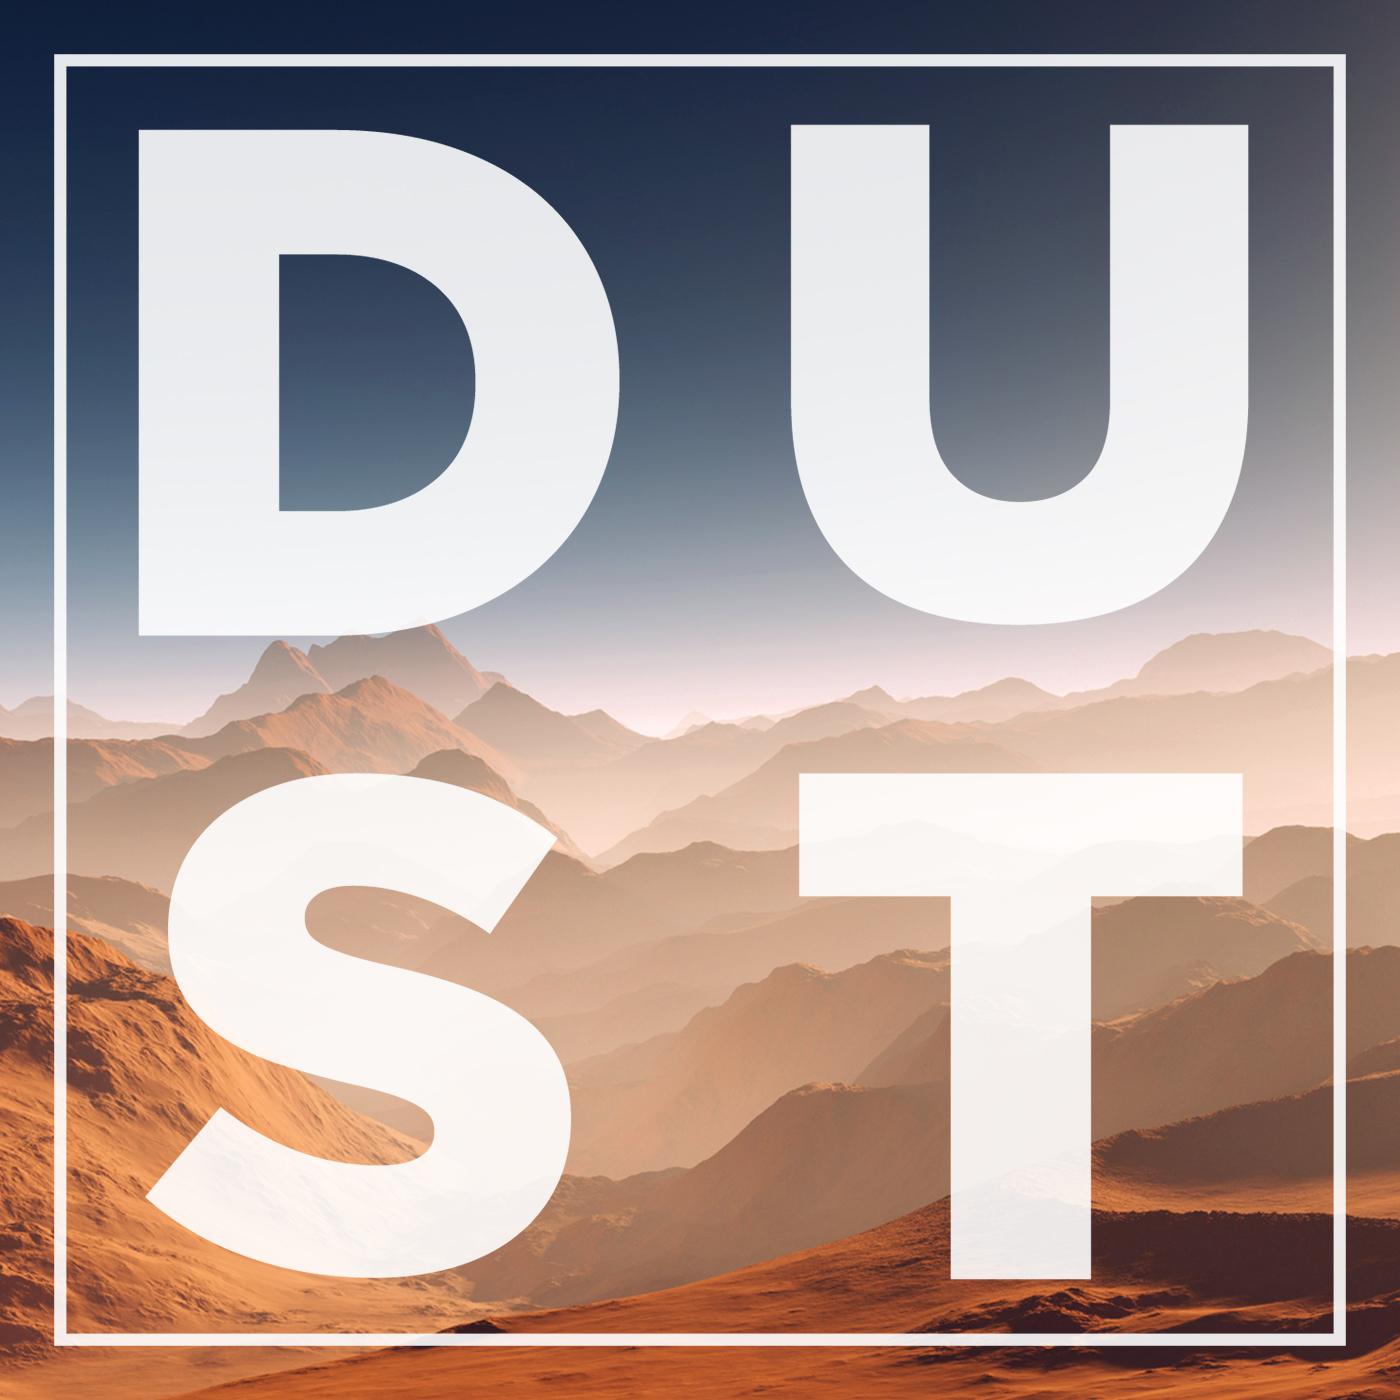 Dust 1x1.jpg